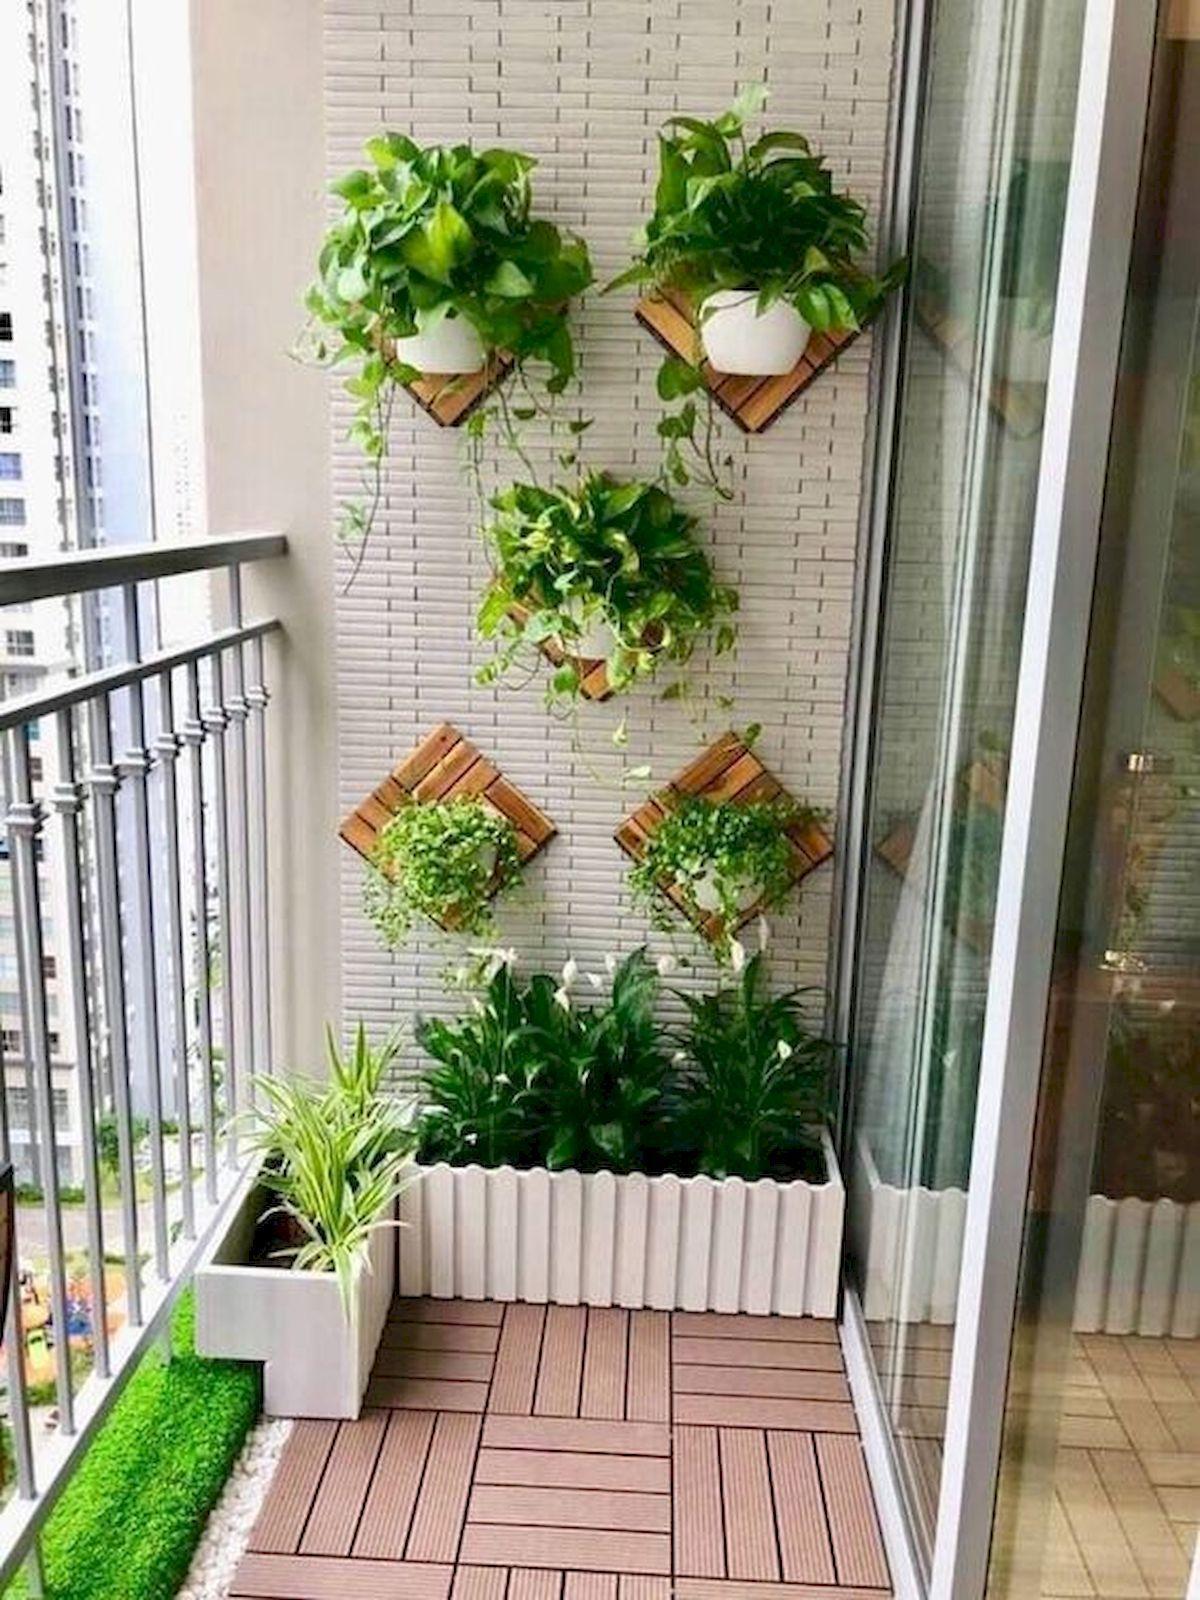 28 Amazing Indoor Garden Design Ideas That Make Your Home